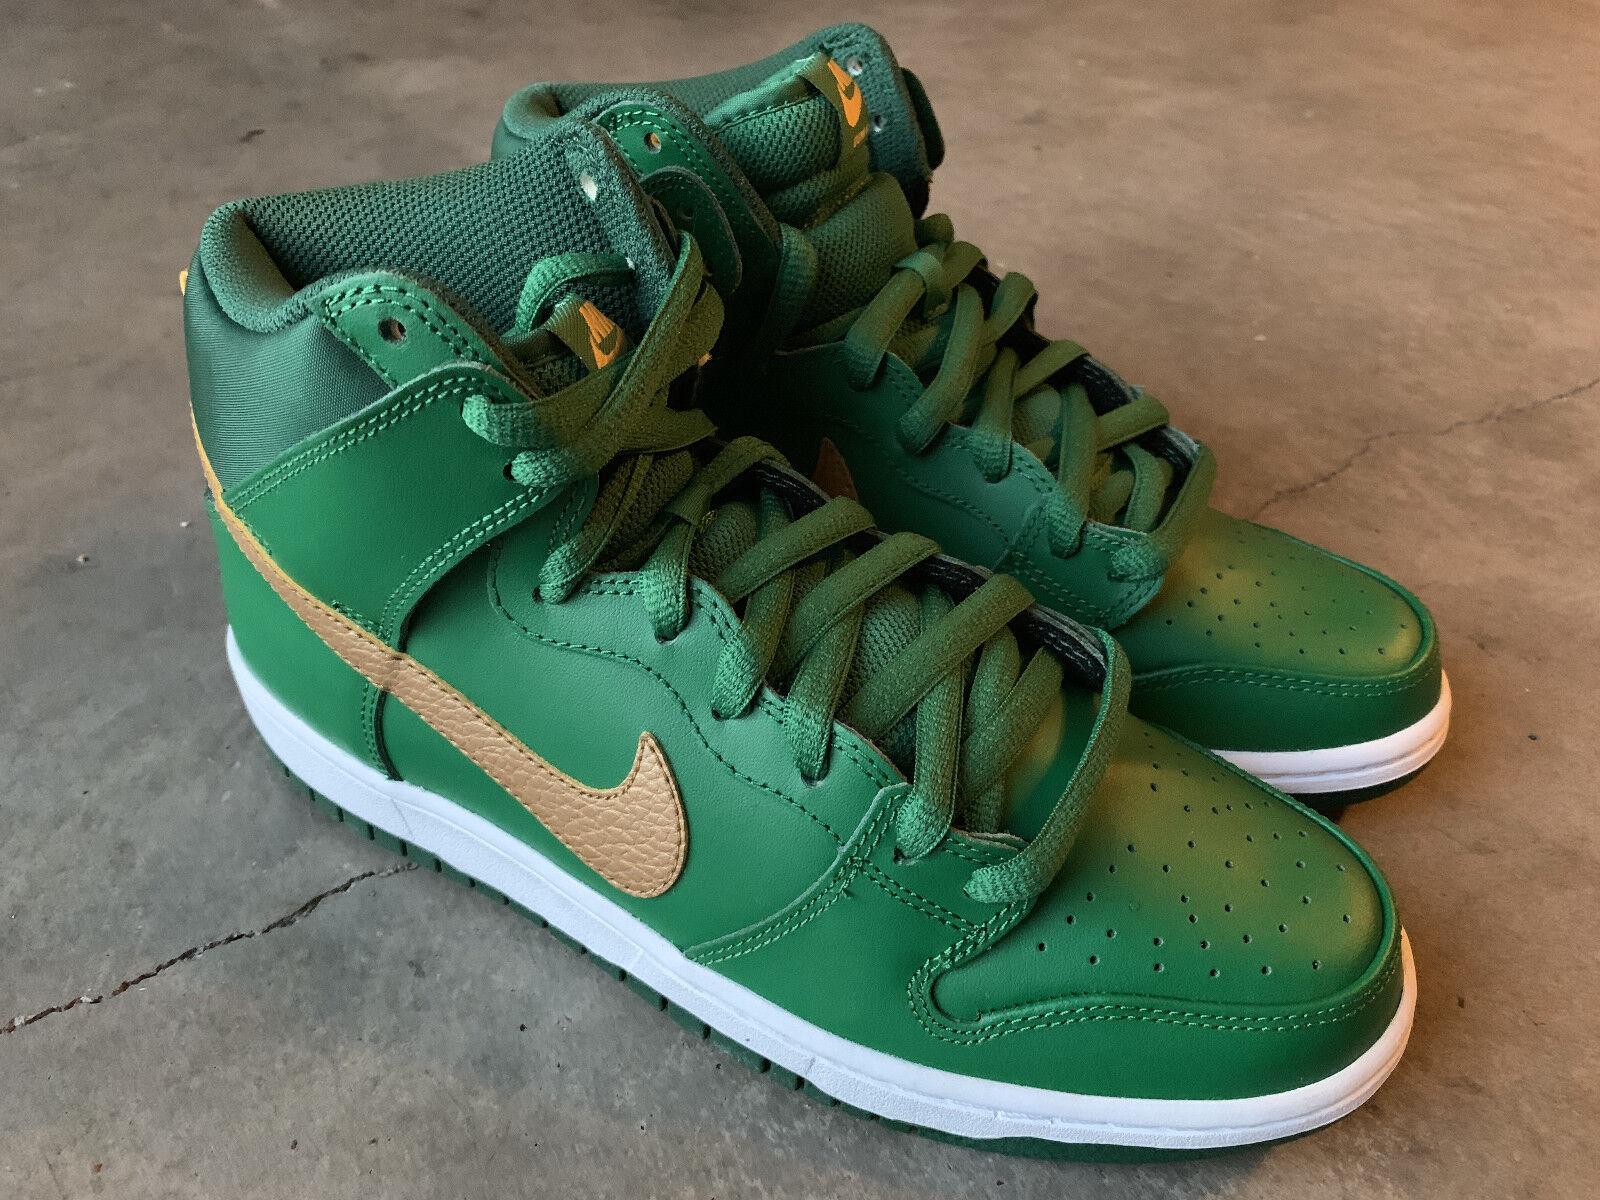 Nike Dunk High Pro SB St. Patty's Day 305050 373 Dimensione 9